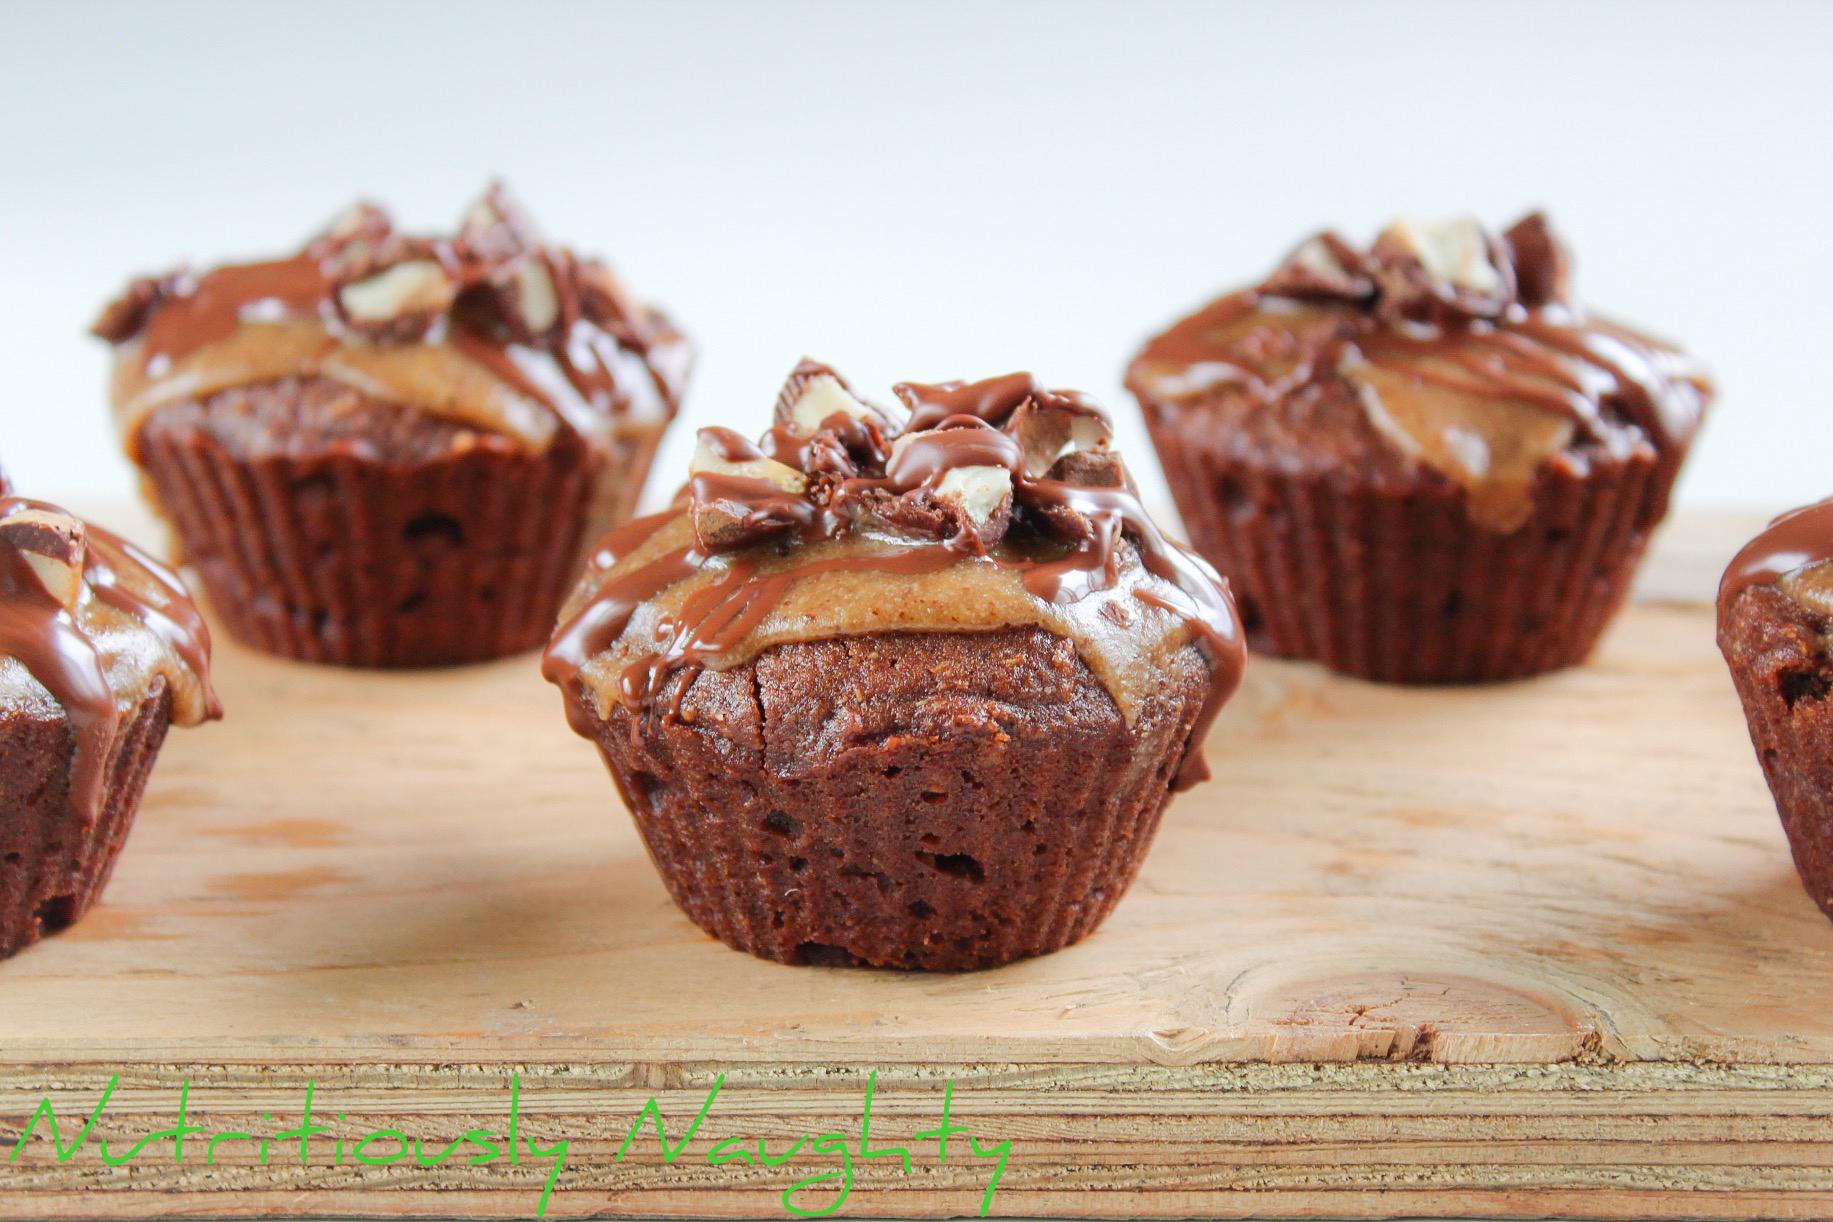 Vegan caramel-topped chocolate cupcakes